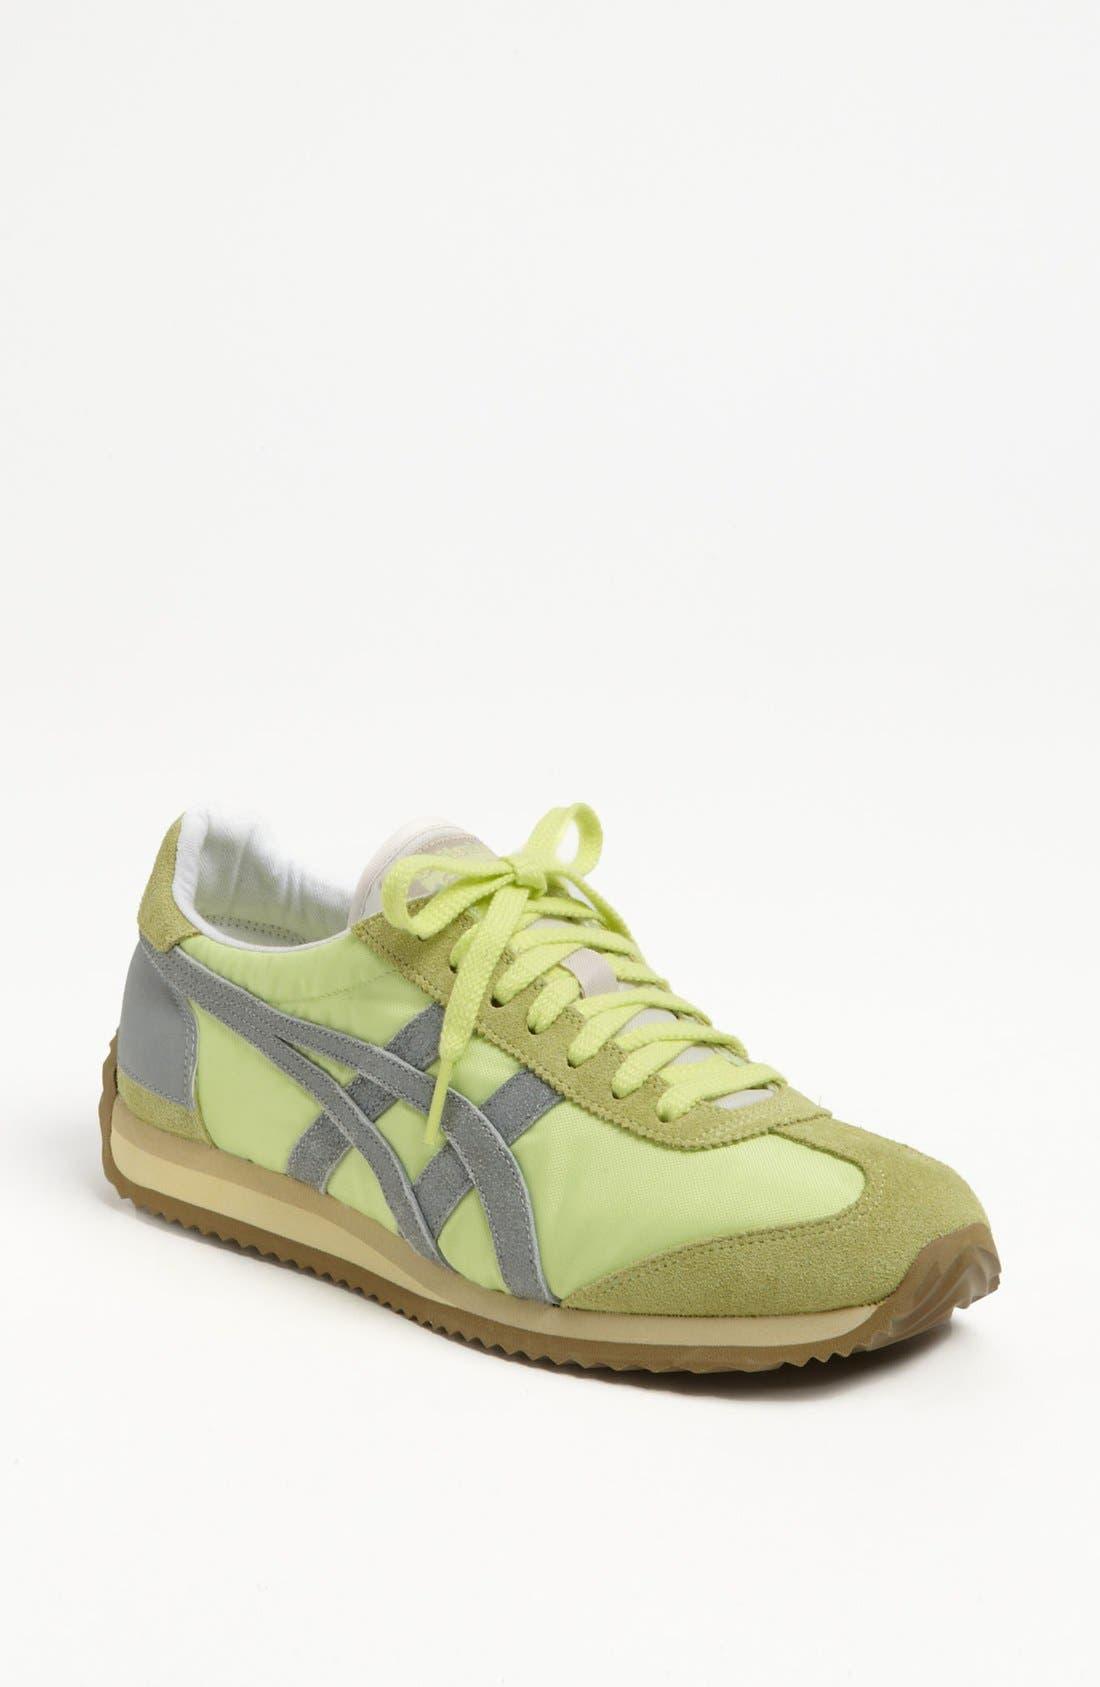 Main Image - Onitsuka Tiger™ 'California 78 Vin' Sneaker (Women)